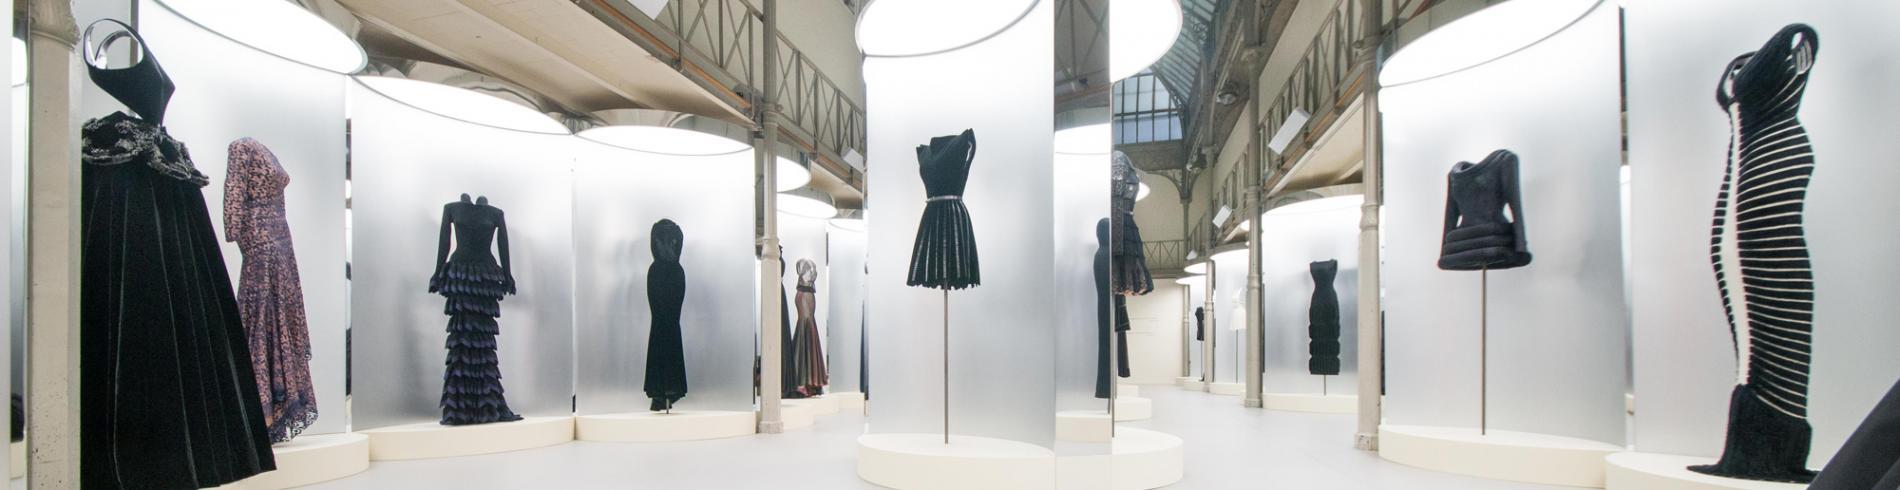 A sober display of Alaïa's dramatic gowns